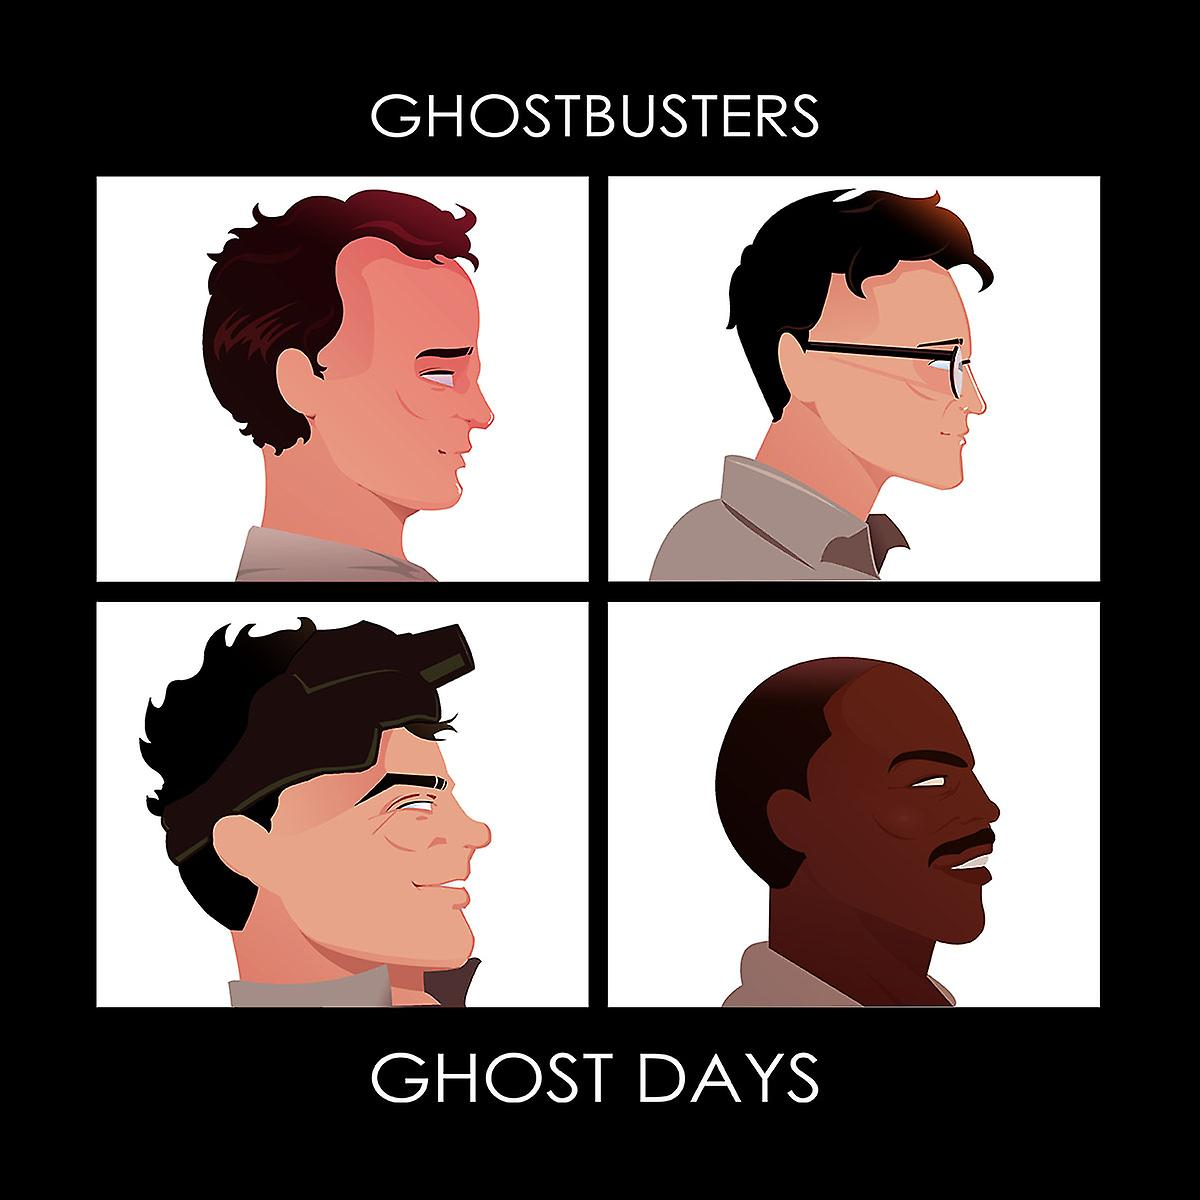 ghostbusters ghost tage 1984 gorillaz album cover damen. Black Bedroom Furniture Sets. Home Design Ideas